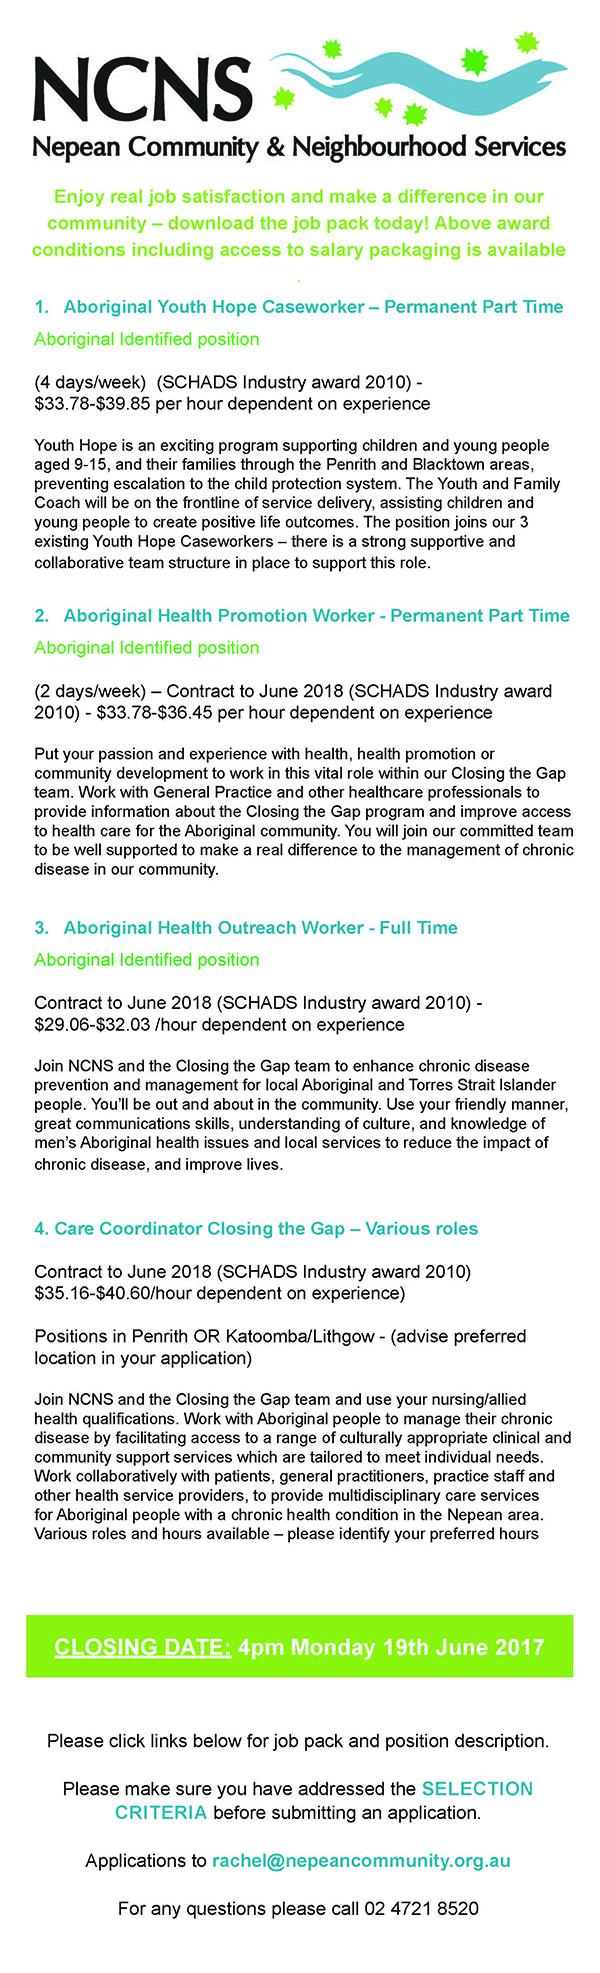 Job Ads June 2017